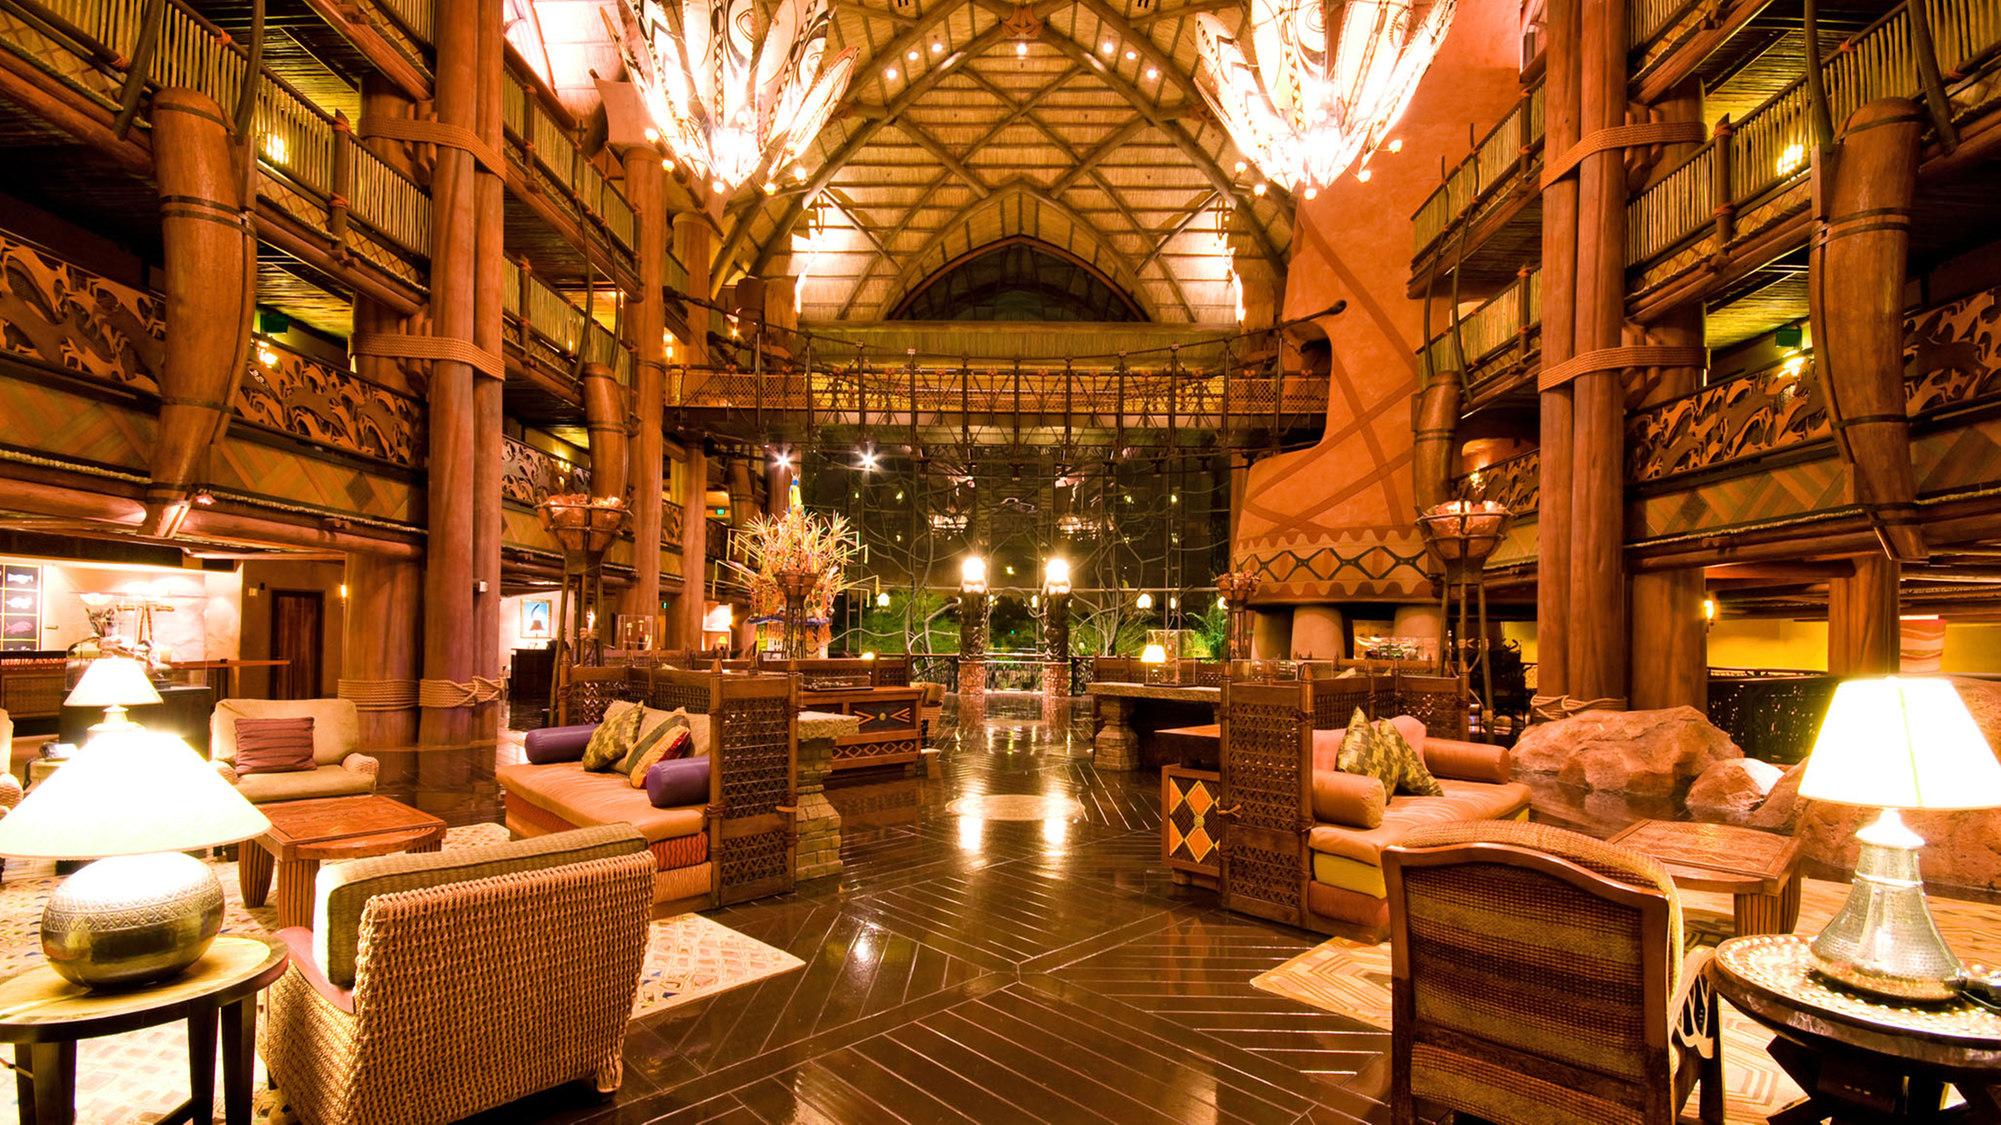 2 Bedroom Suites In Orlando Near Disney Animal Kingdom Lodge Conducting Cashless Pilot Through